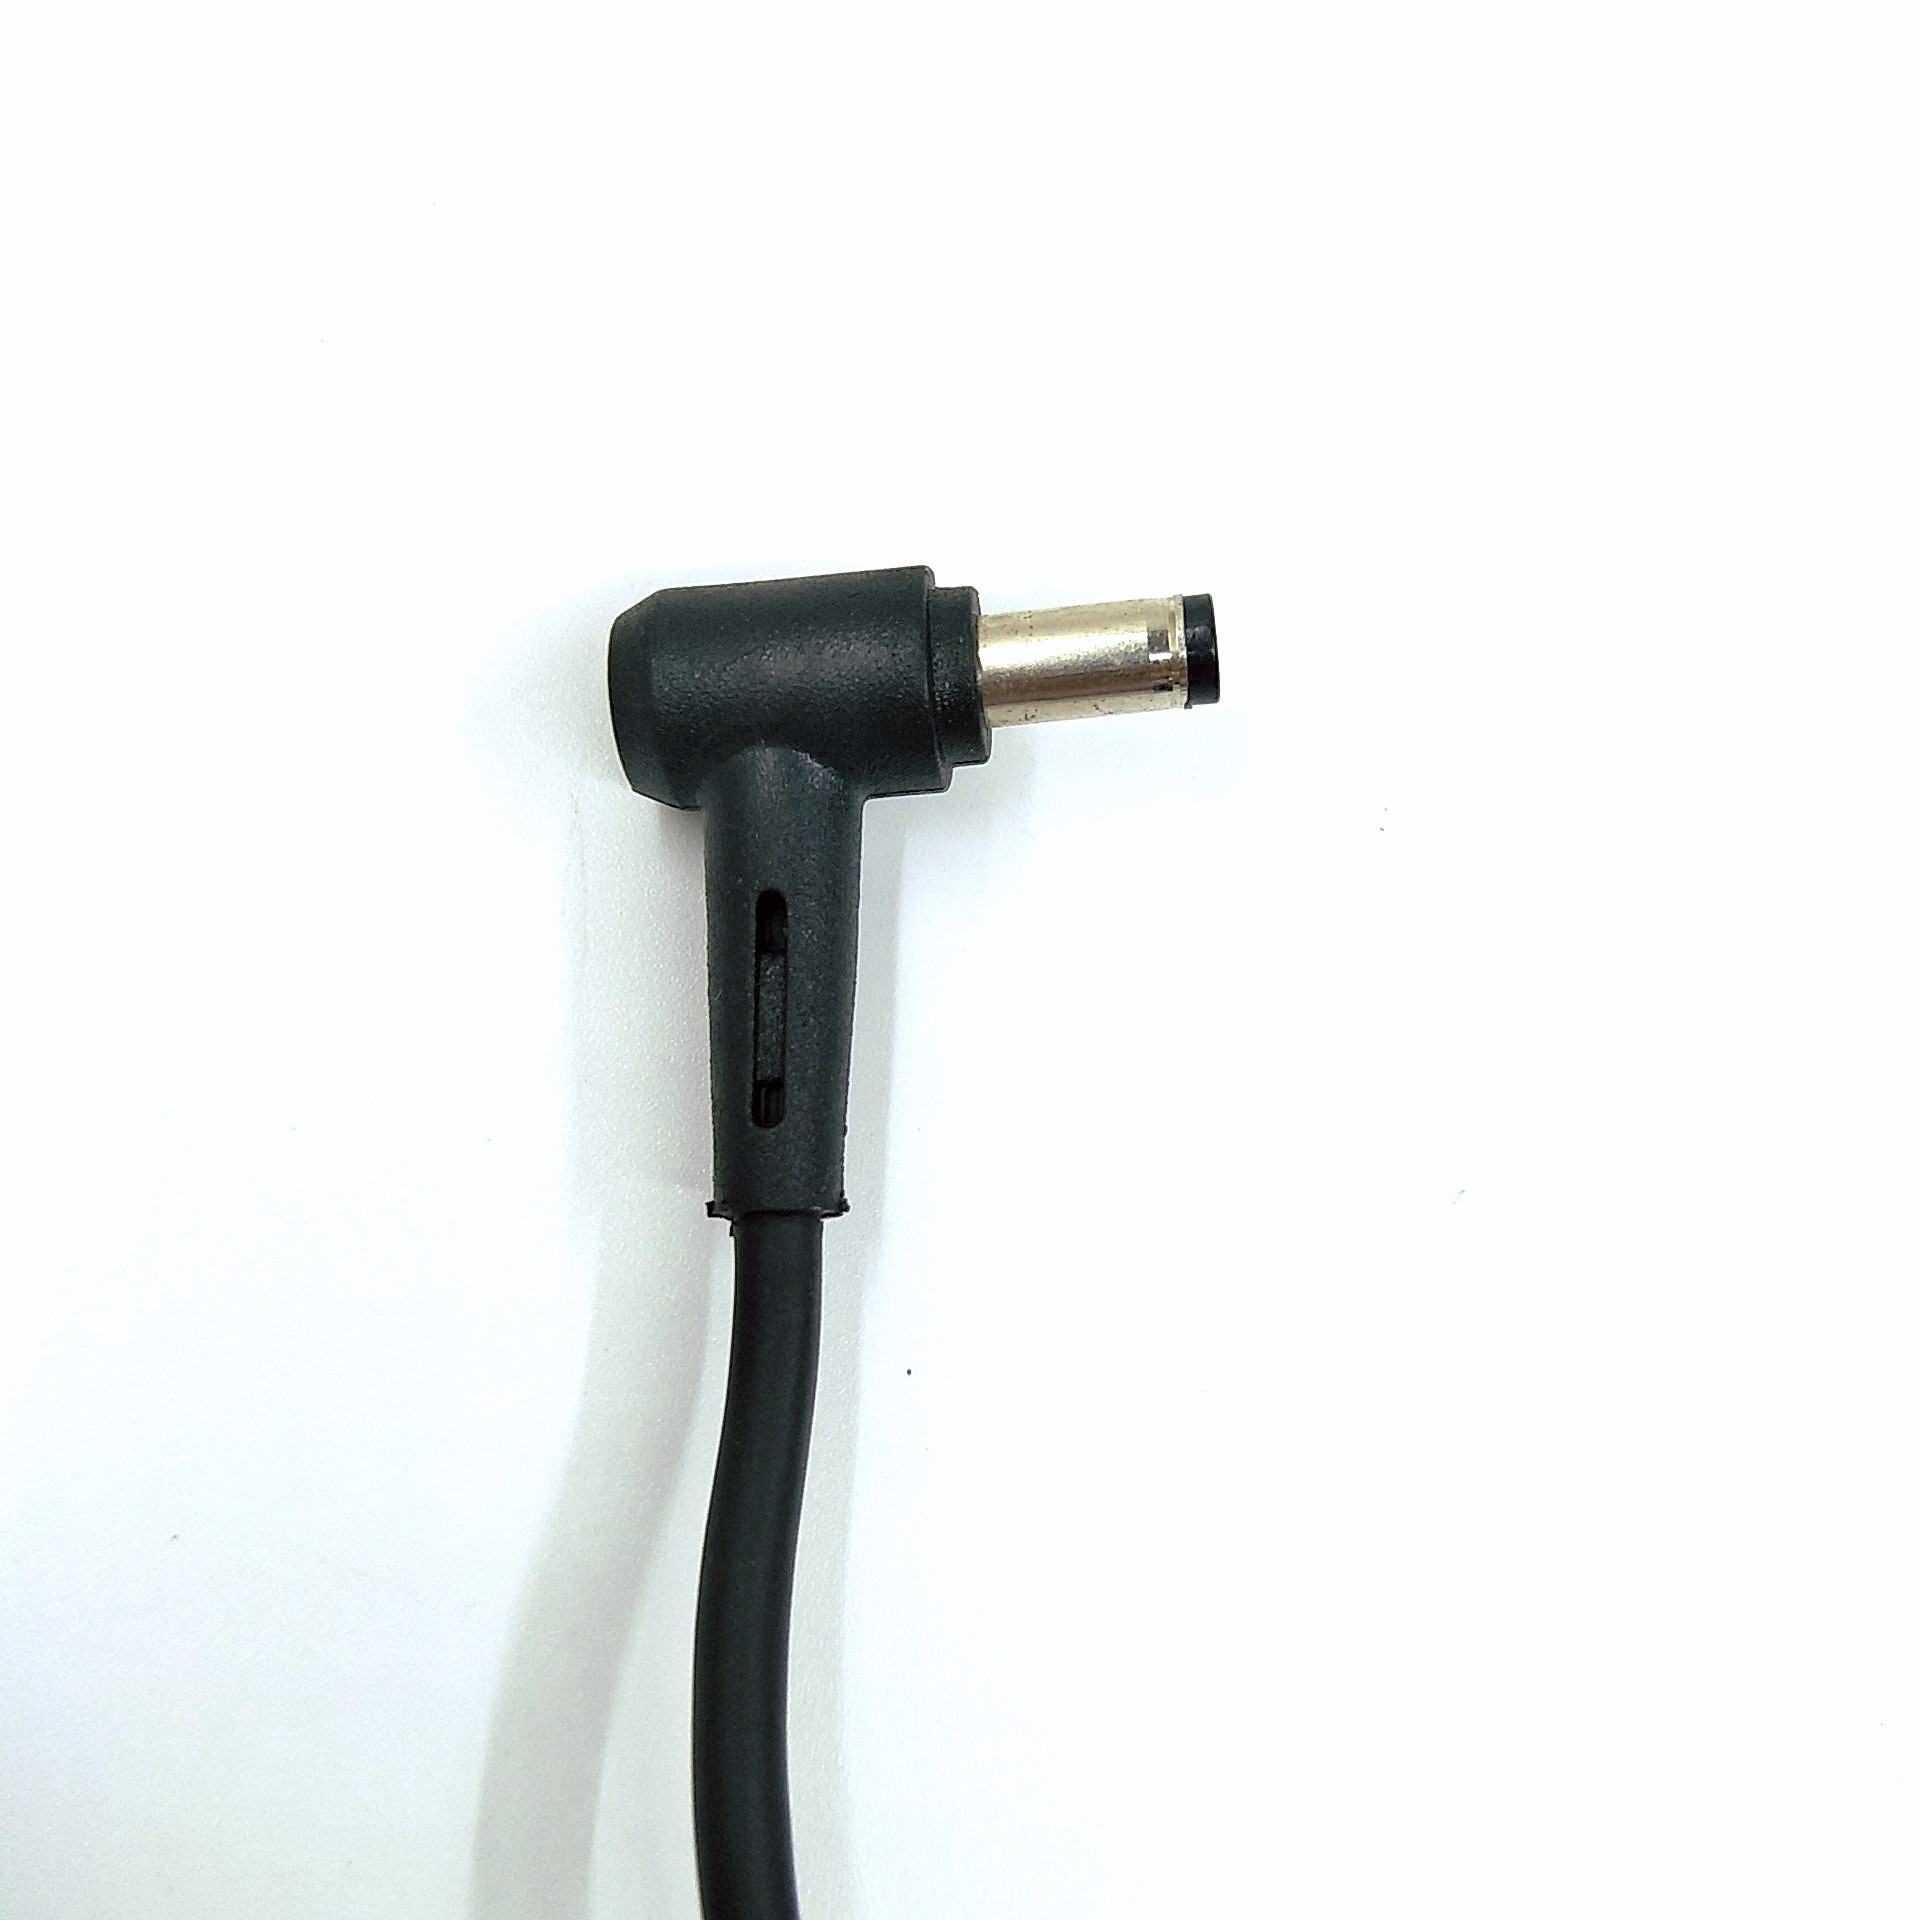 Купить с кэшбэком 65w 19V 3.42A EU Plug AC Adapter Battery Charger For Asus X751m X750LN-TY012H TP500L TP550L Q552 X552E X551 X550C EXA1208EH